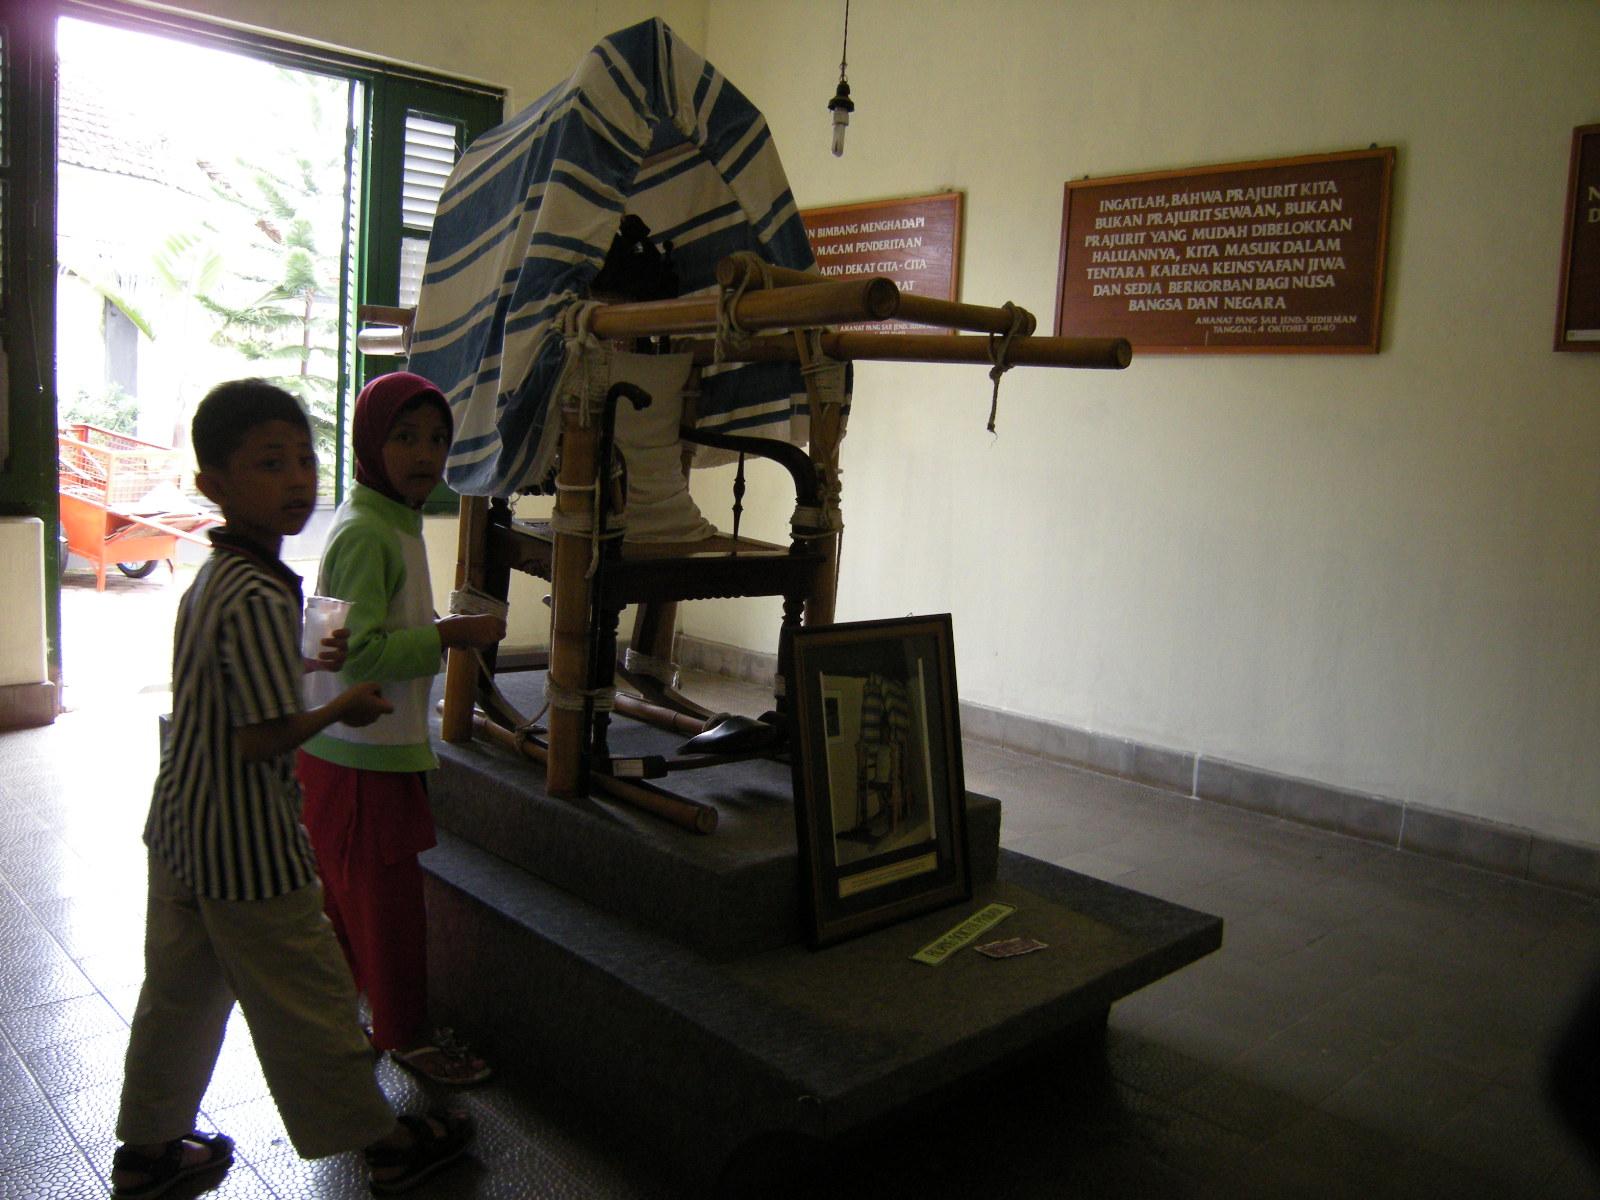 Sahabat Alam Museum Sudirman Kota Magelang Panglima Besar Memiliki Objek